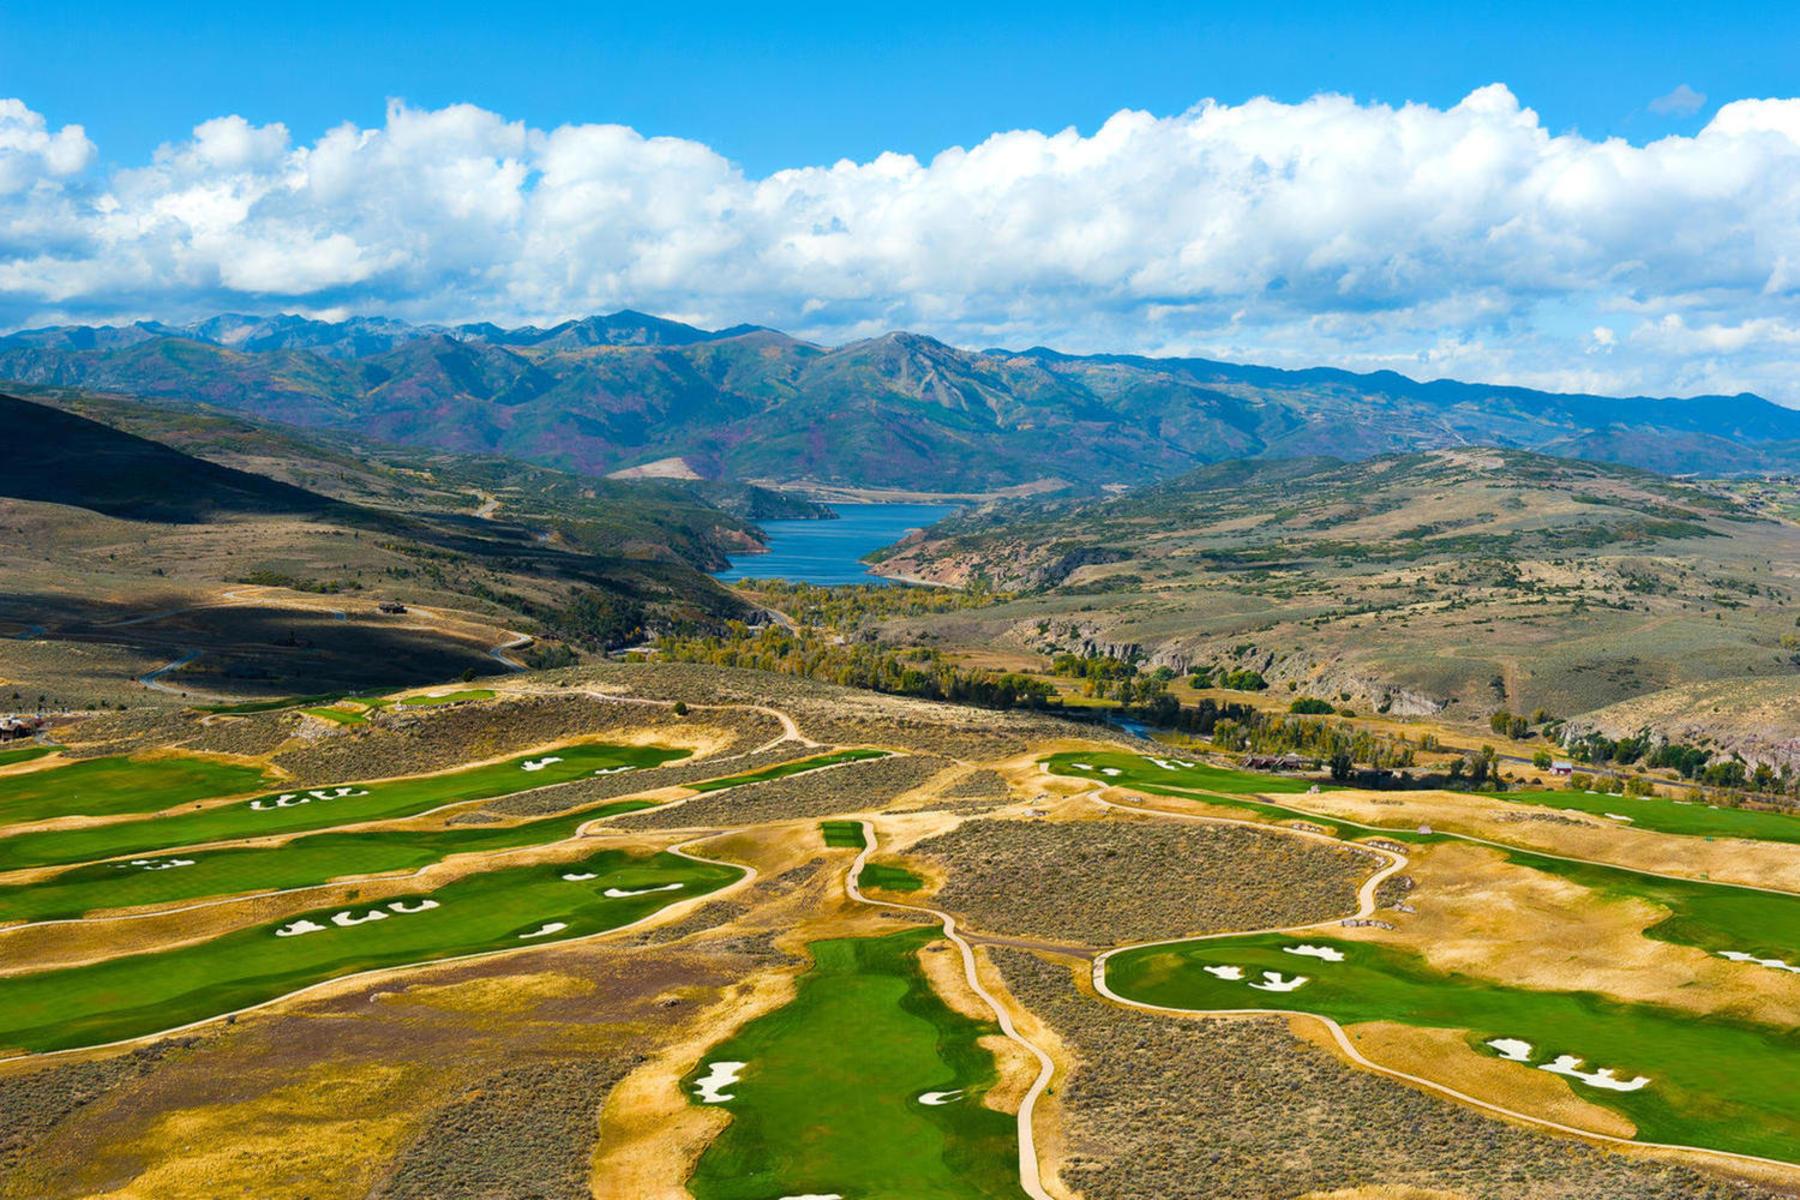 Terreno para Venda às Gorgeous Panoramic Views at Victory Ranch 6090 E Blue Wing Lp Lot 73 Heber City, Utah, 84032 Estados Unidos